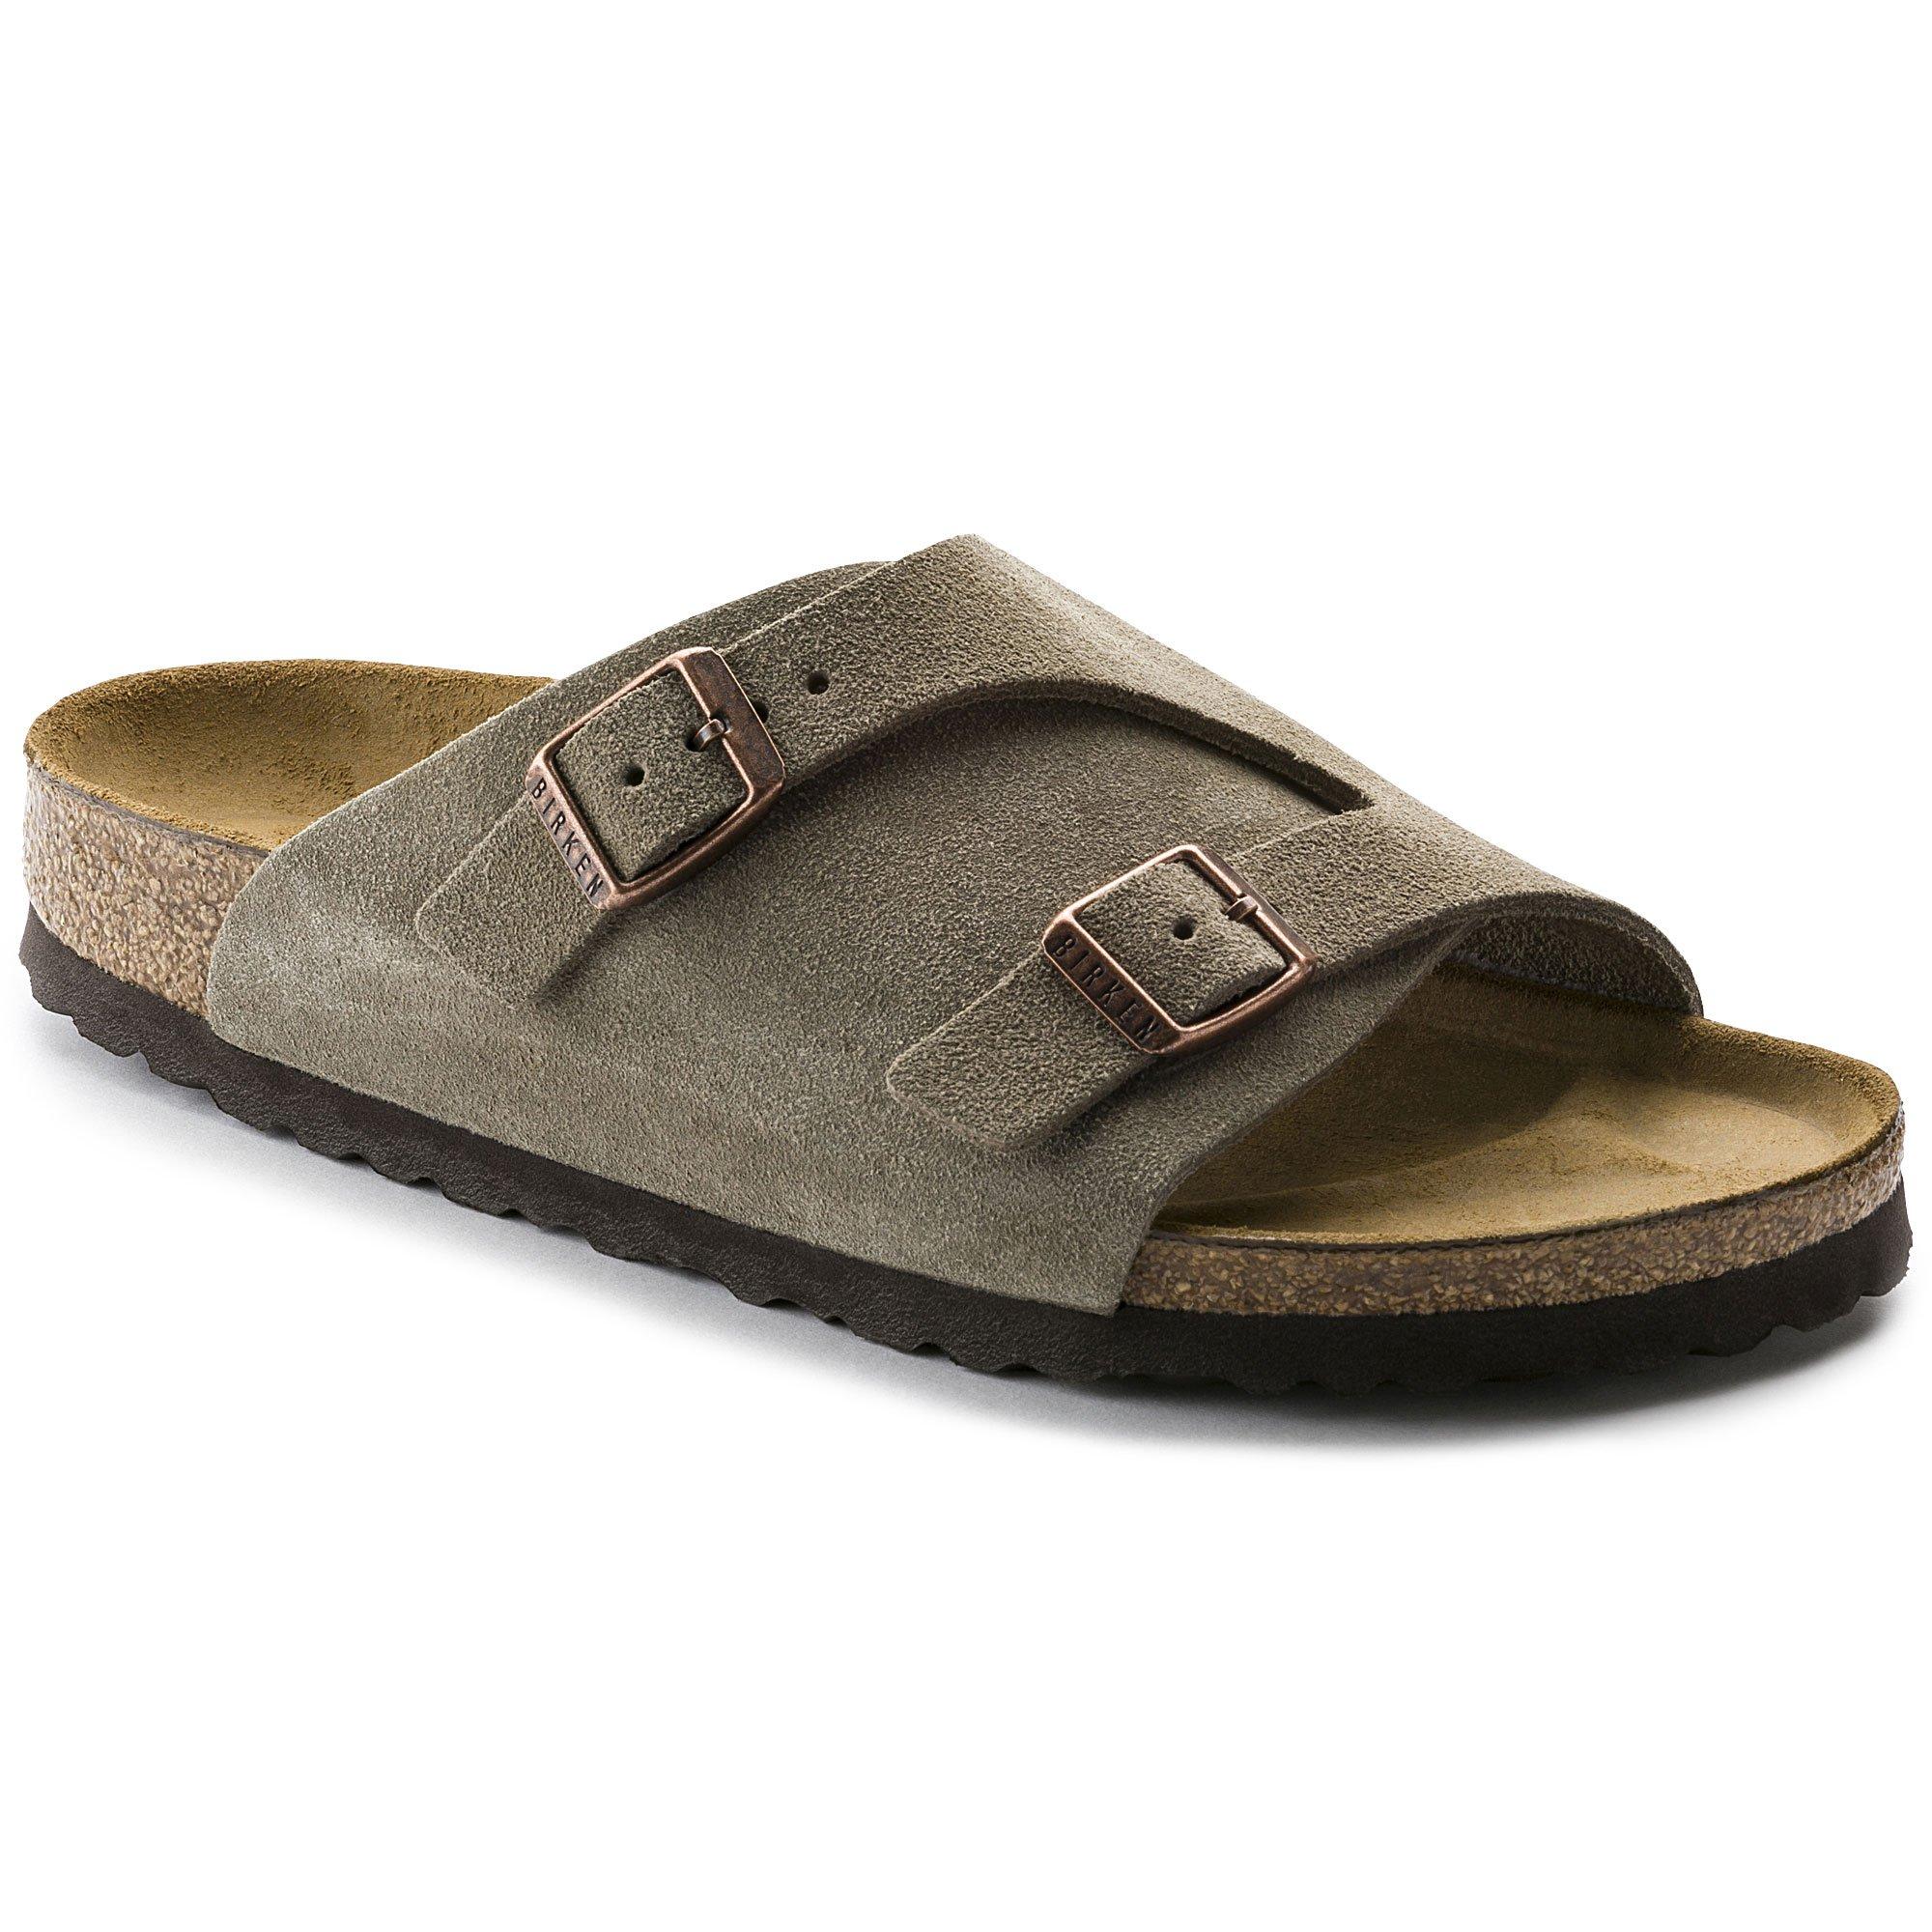 Birkenstock Zurich Sandal Taupe Suede Size 40 by Birkenstock